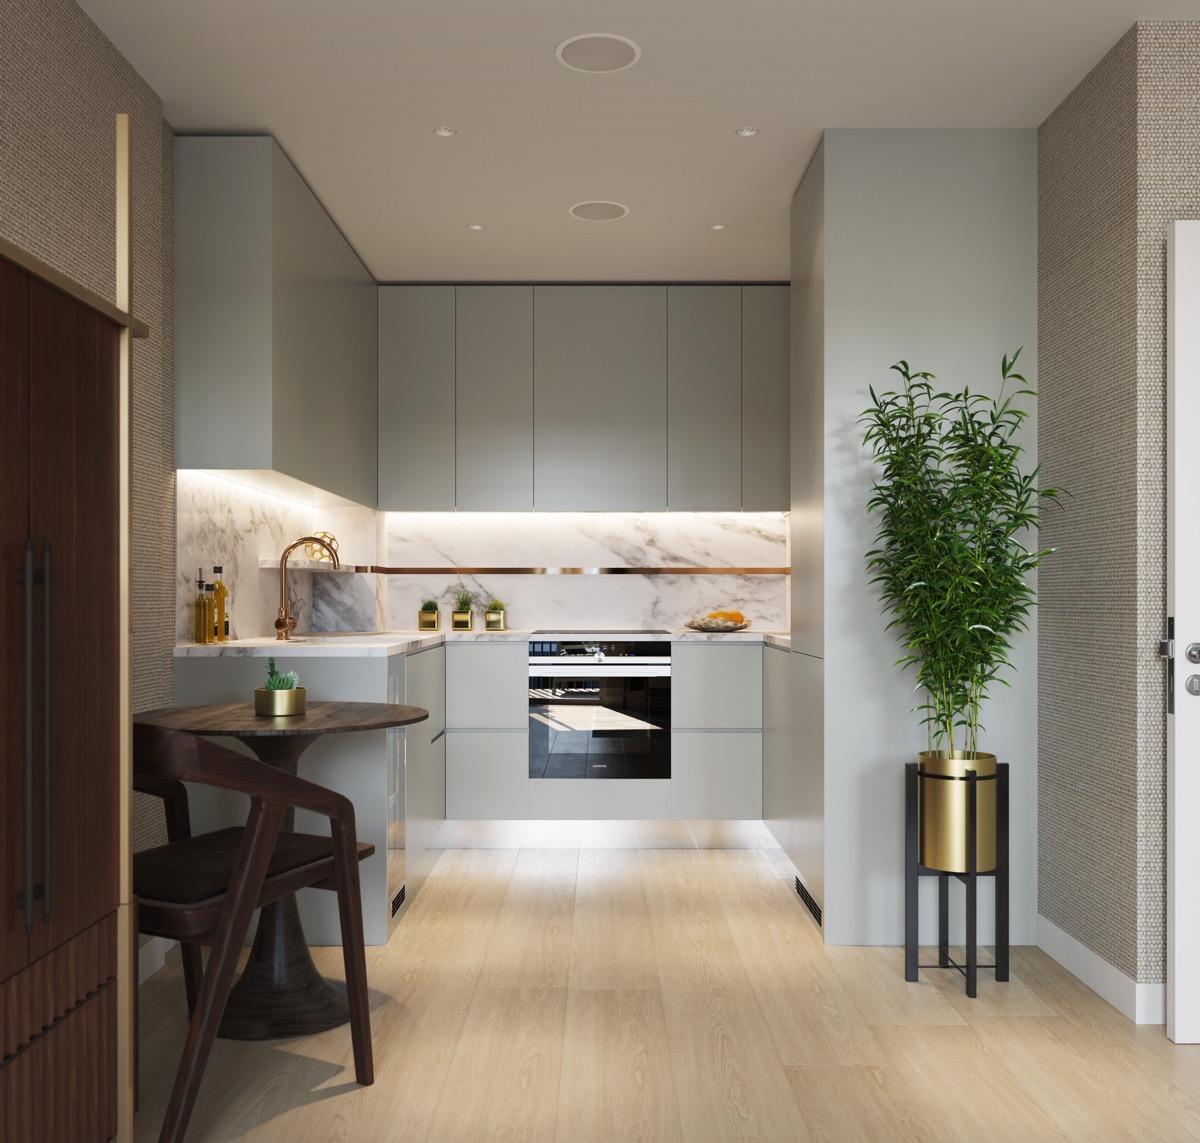 50 Desain Idaman Dapur Modern Bentuk U Rumahku Unik